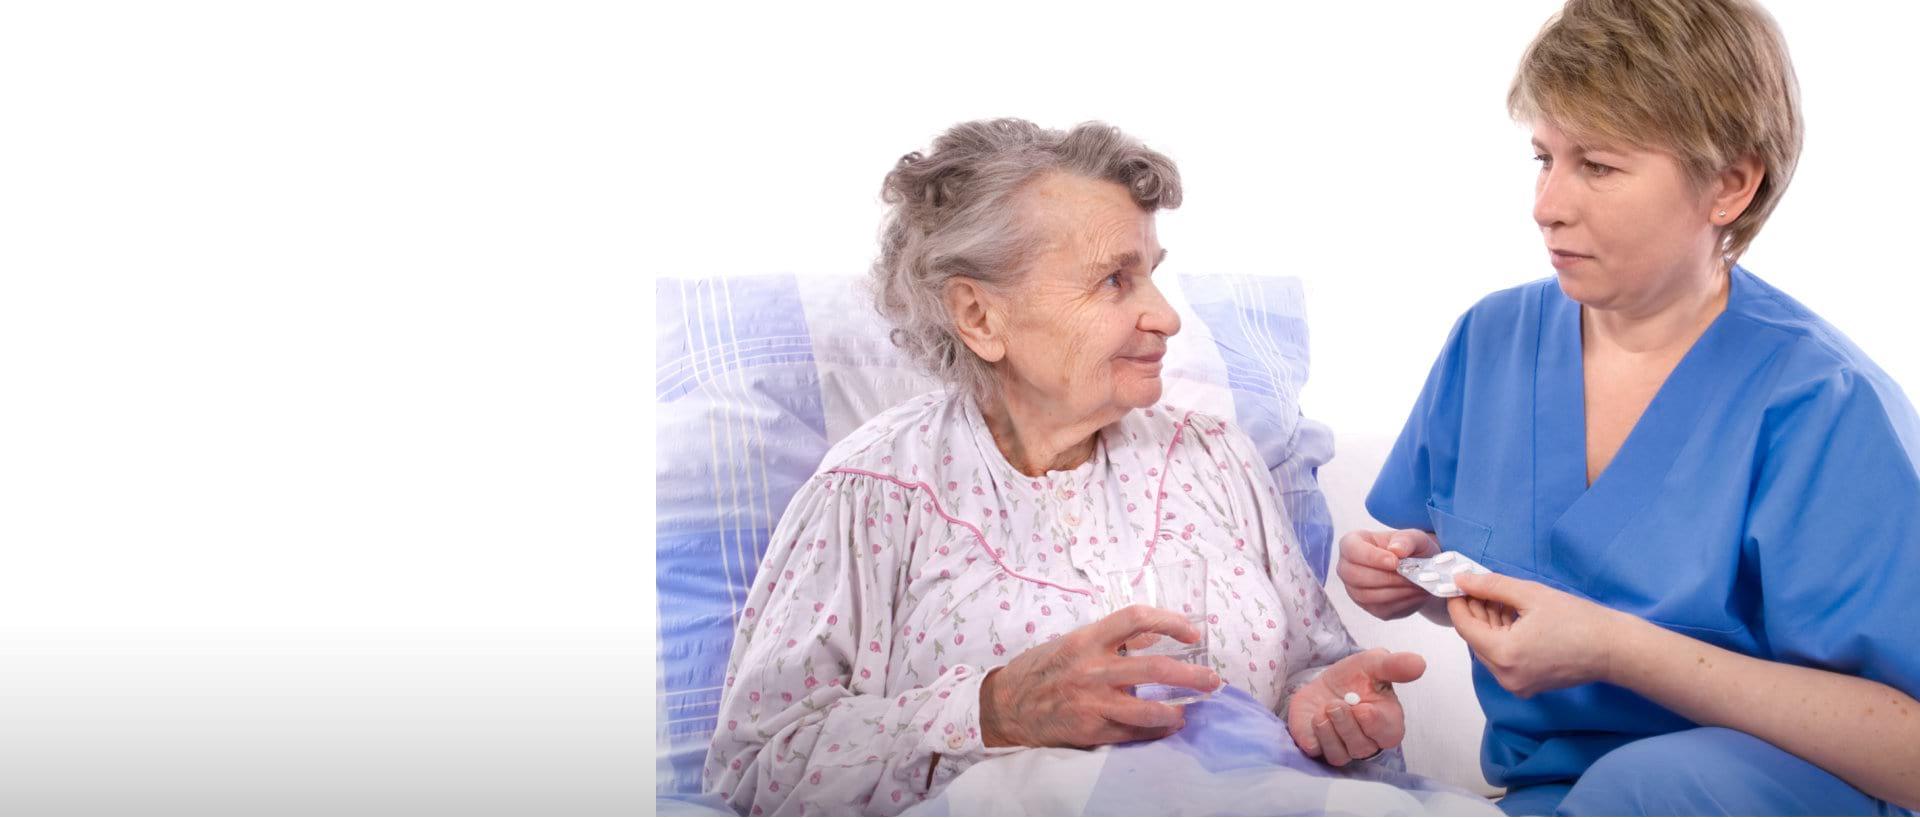 caregiver giving medicines to senior woman